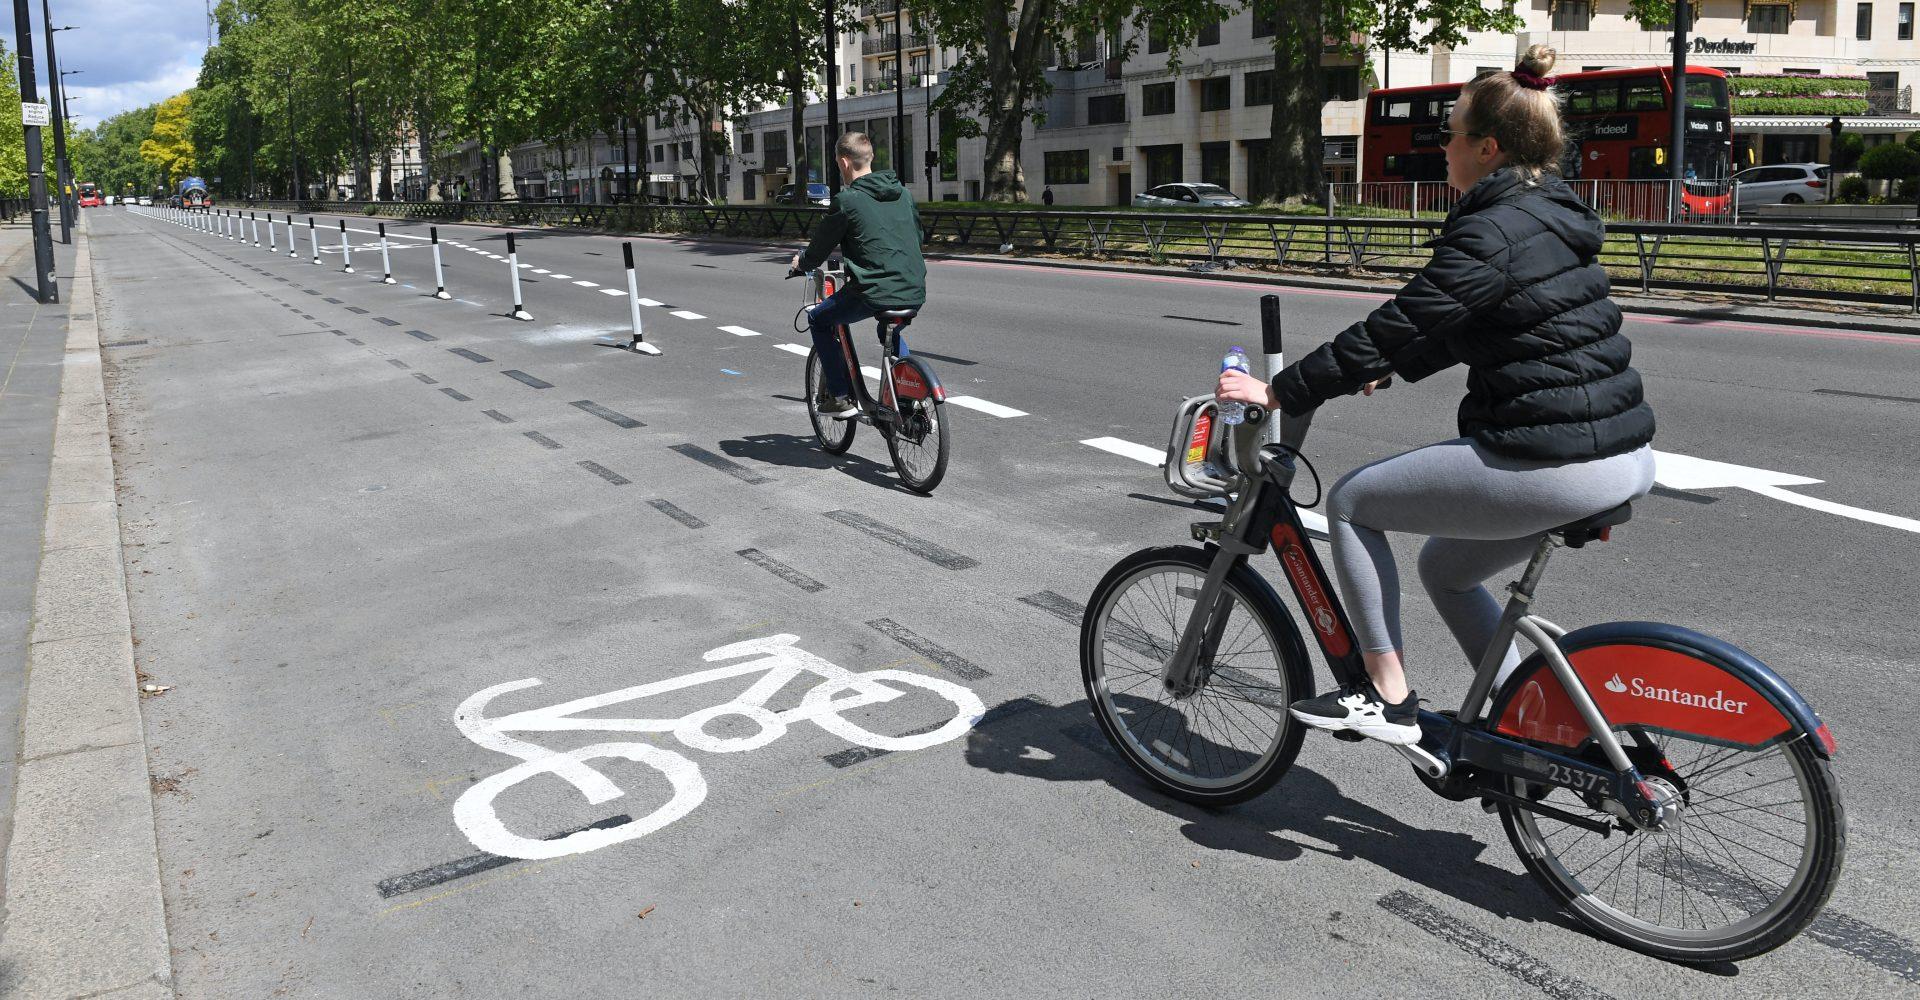 Opposition to bike lanes 'massively' overestimated